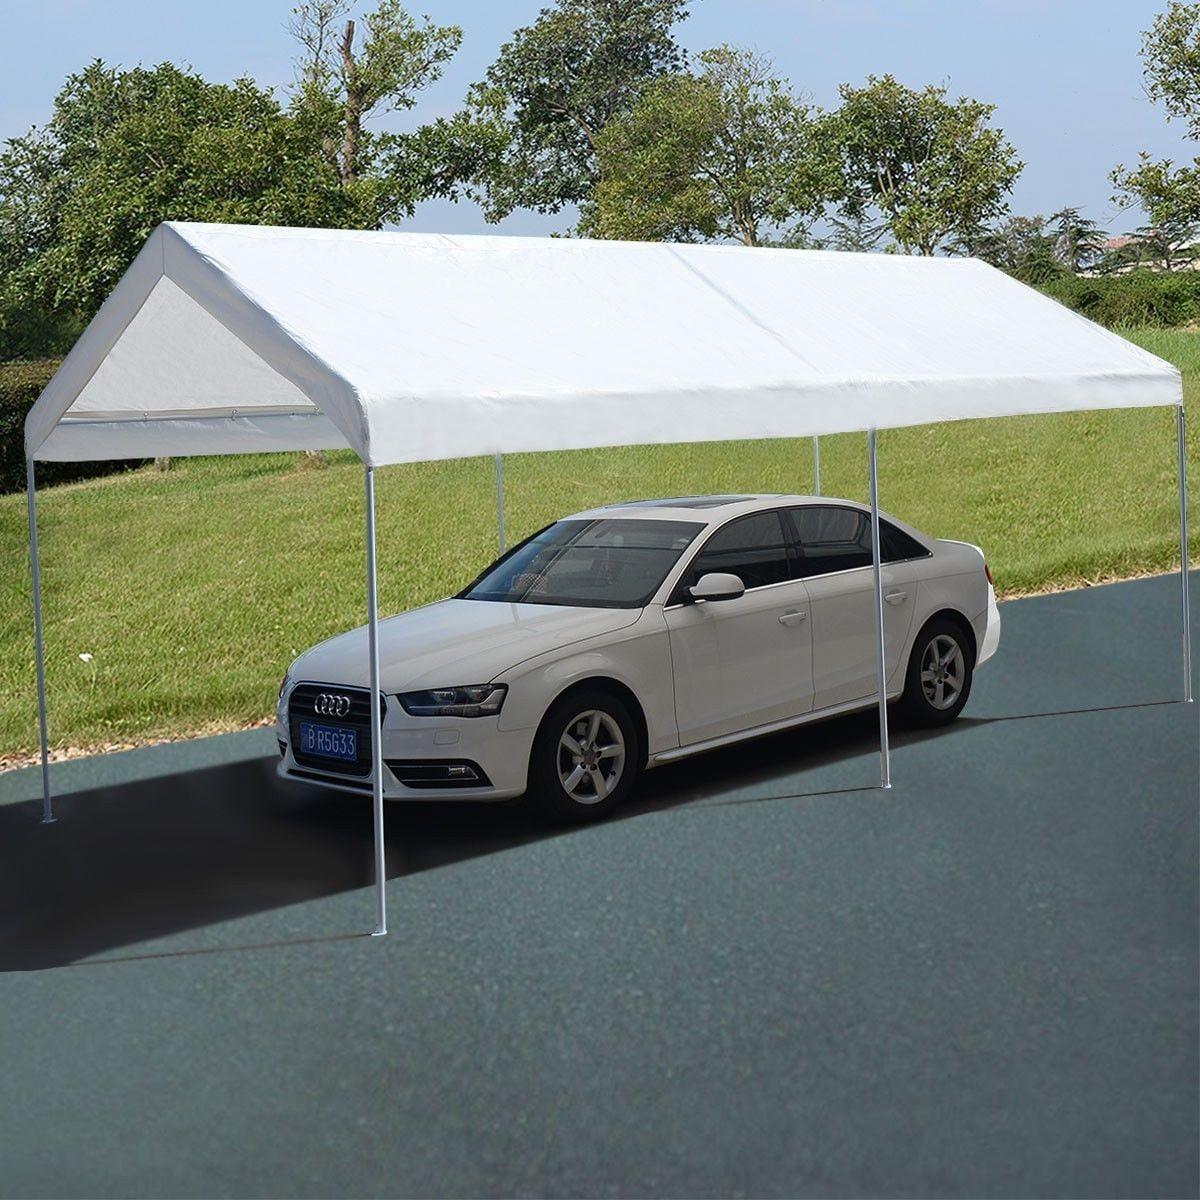 Apontus 10 x 20 Steel Frame Canopy Shelter Portable Car ...